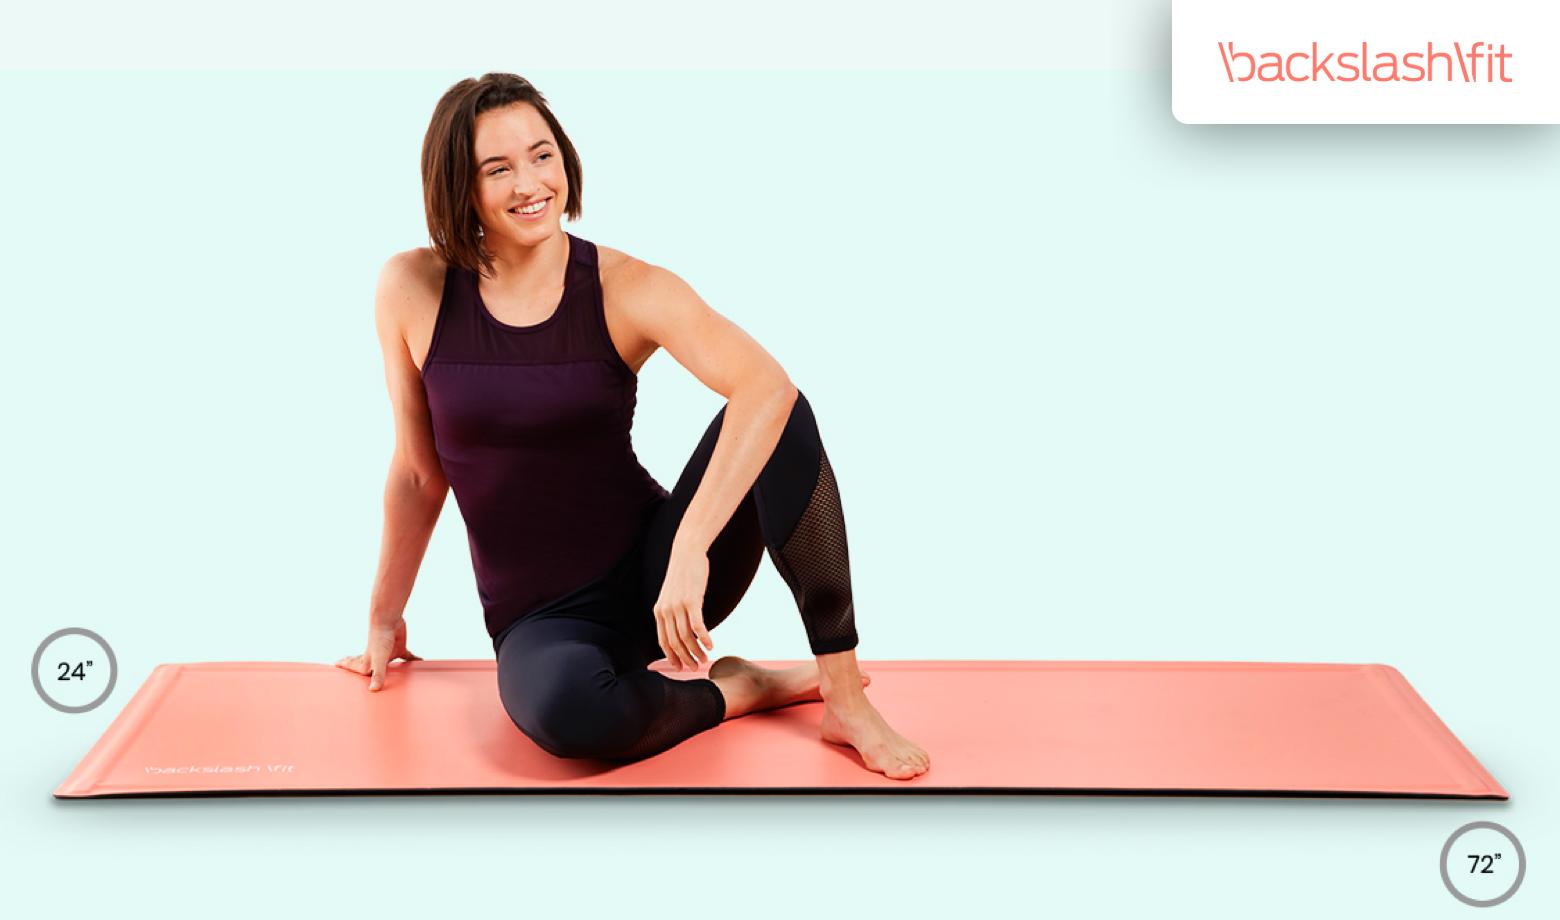 Backlashfit Smart Yoga Mat